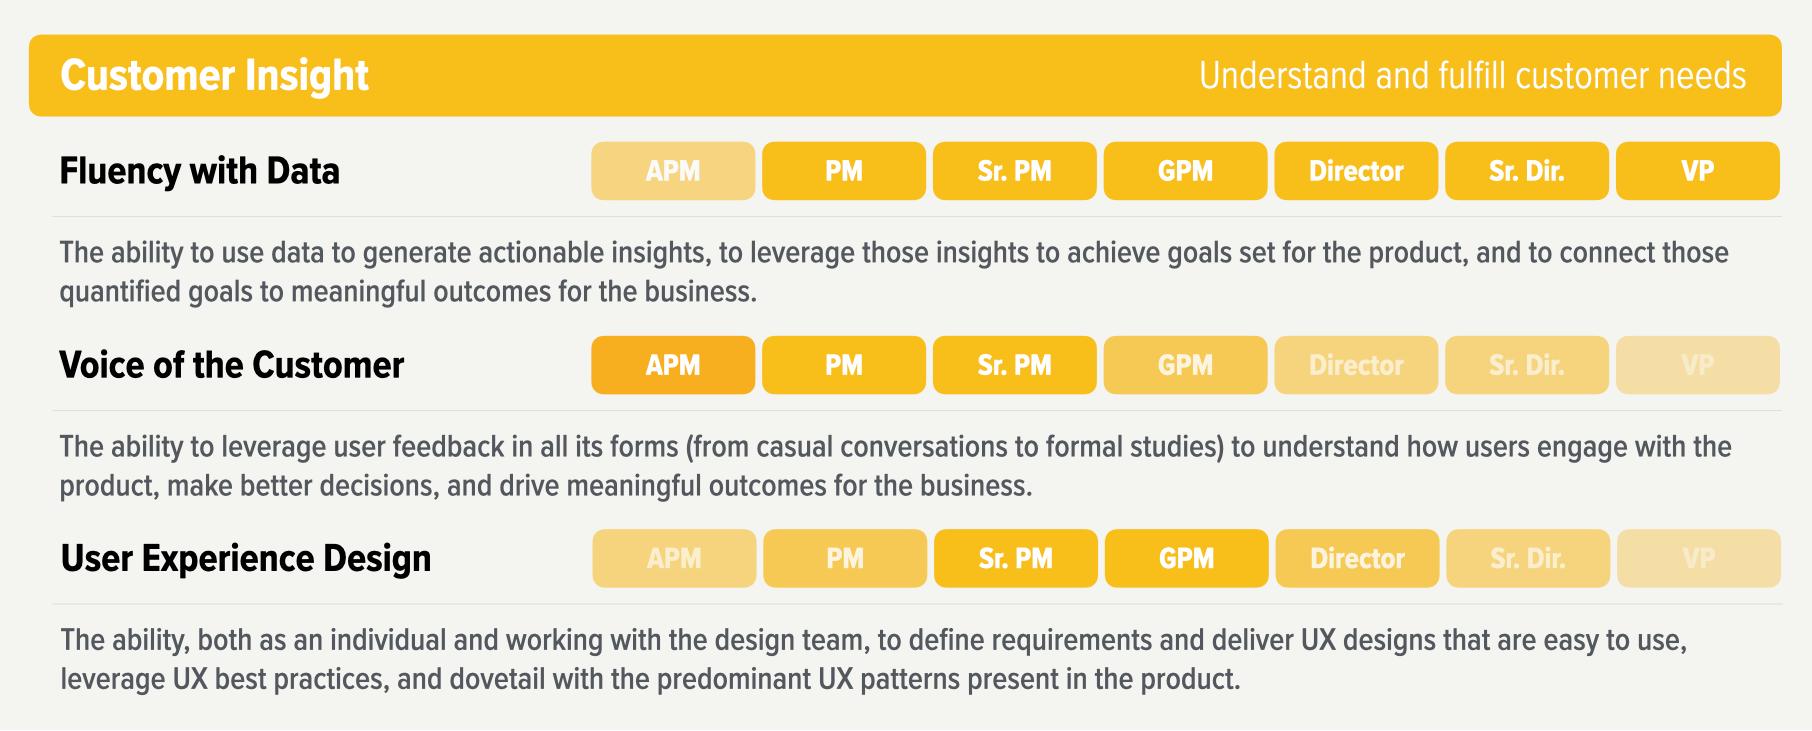 Customer Insight and Analytics Skills